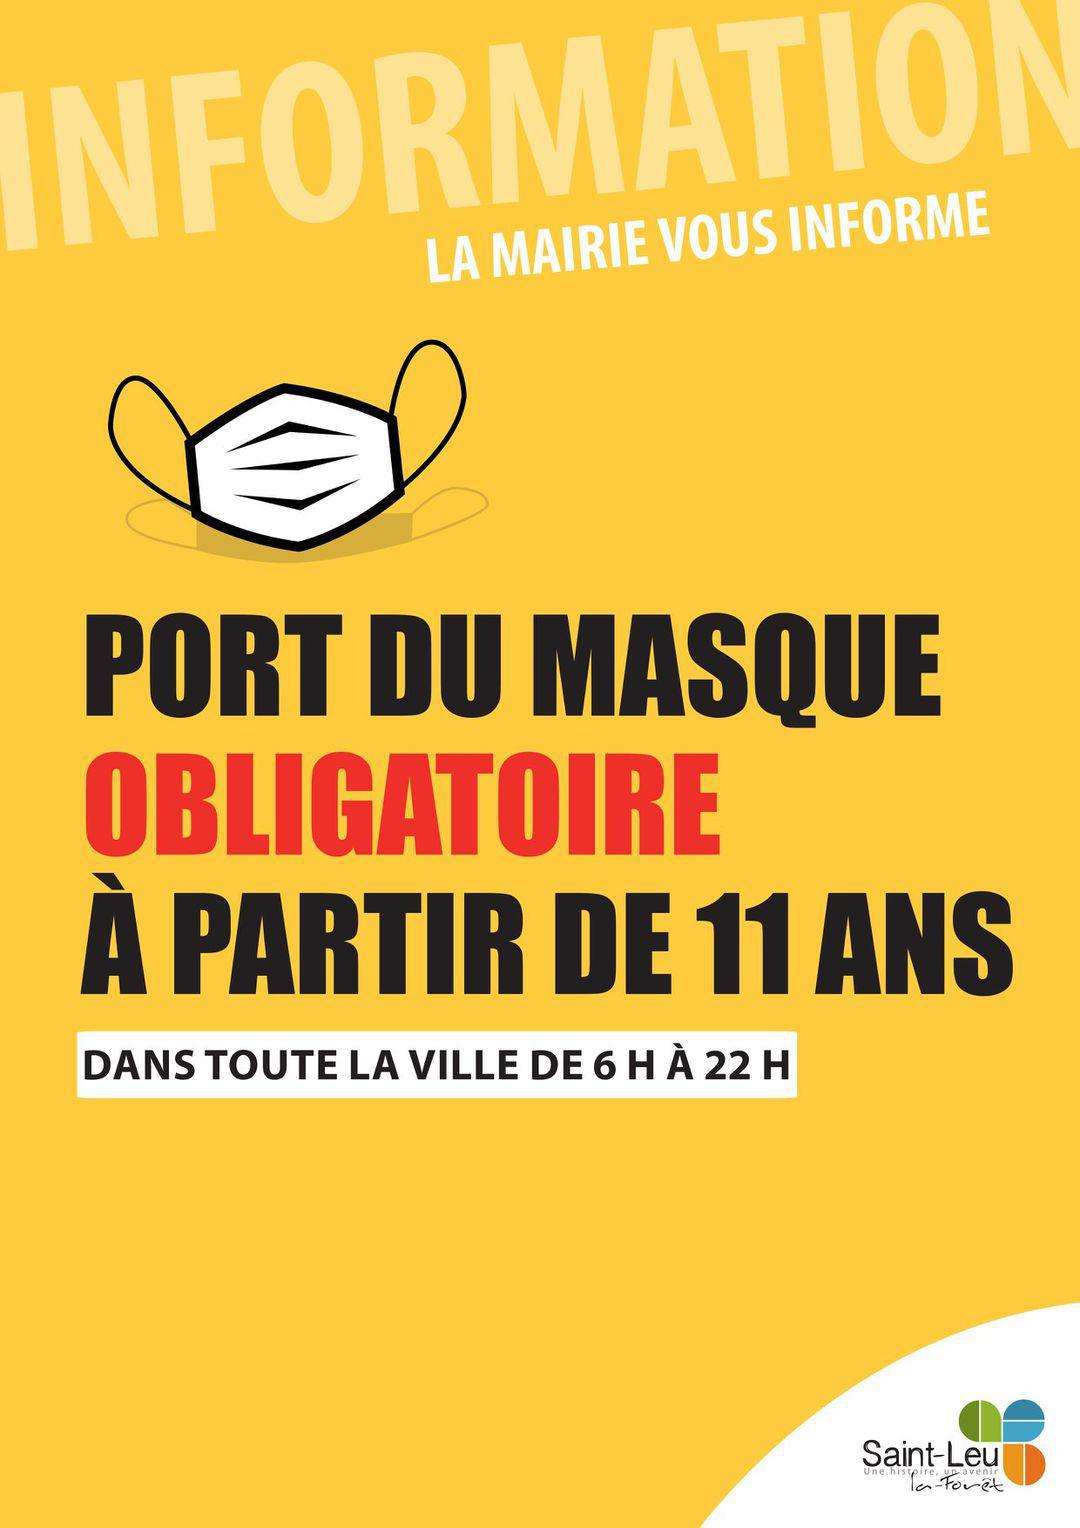 Port du masque - info Mairie